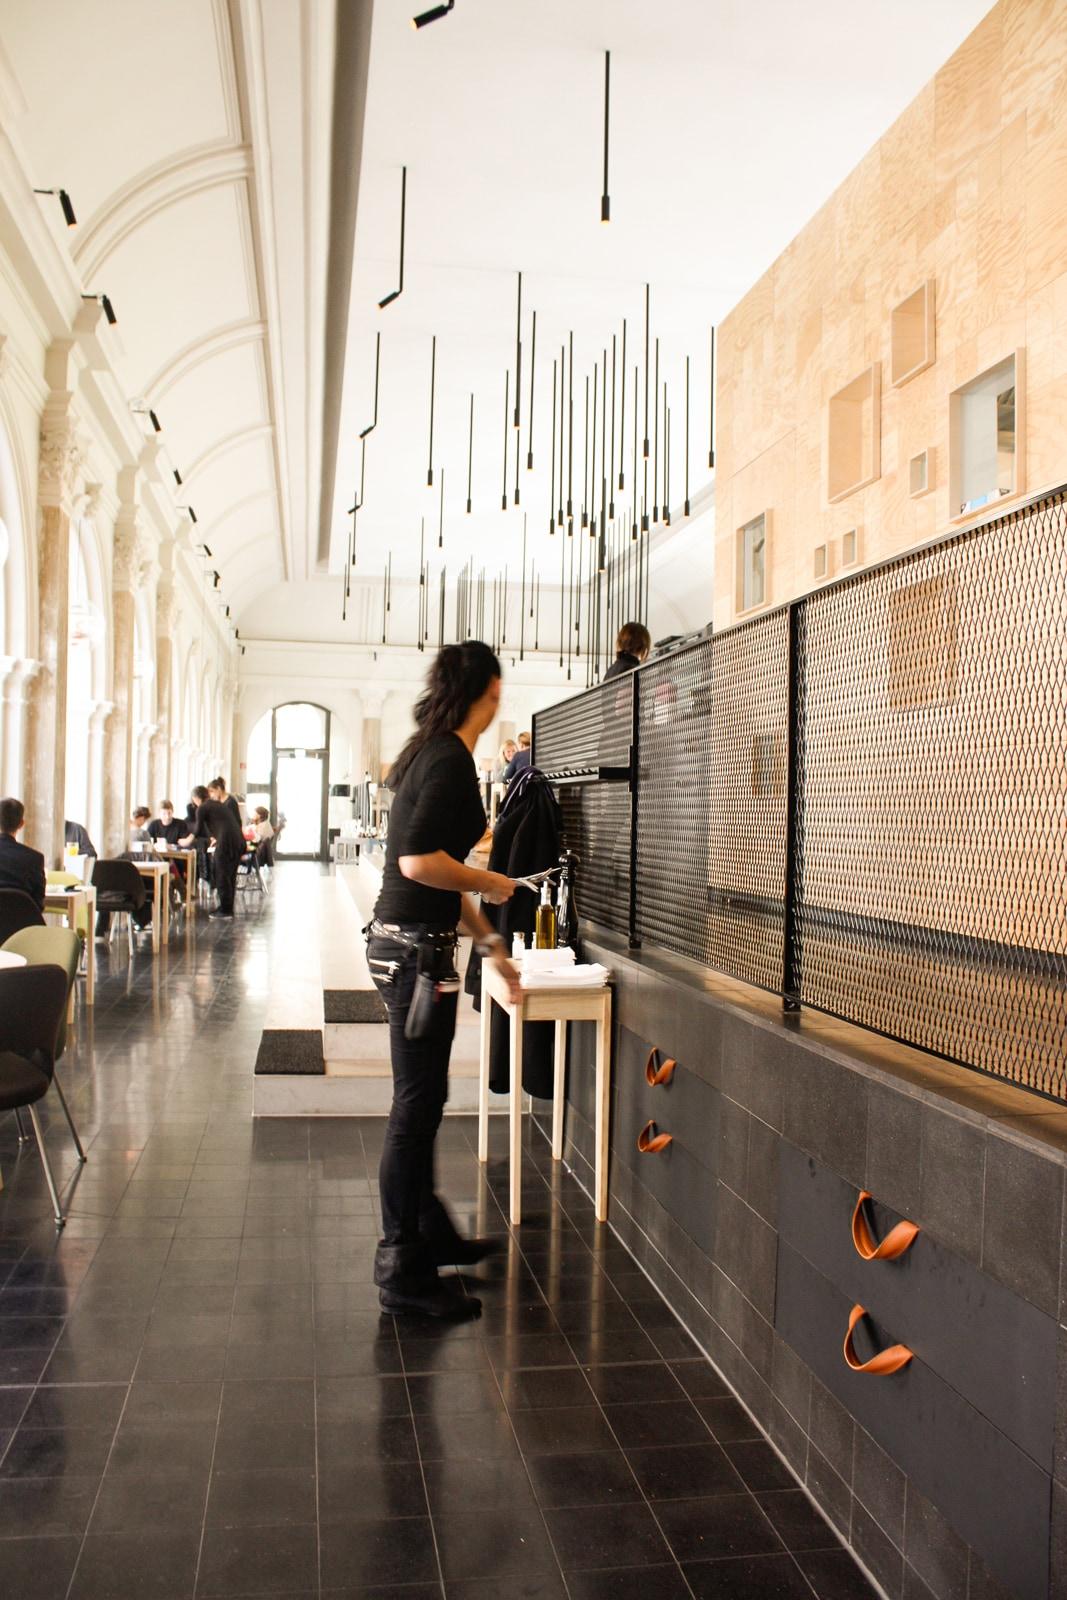 VIA_Terrazzoplatten-nummer-700060_restaurant-spital-04 | 700060